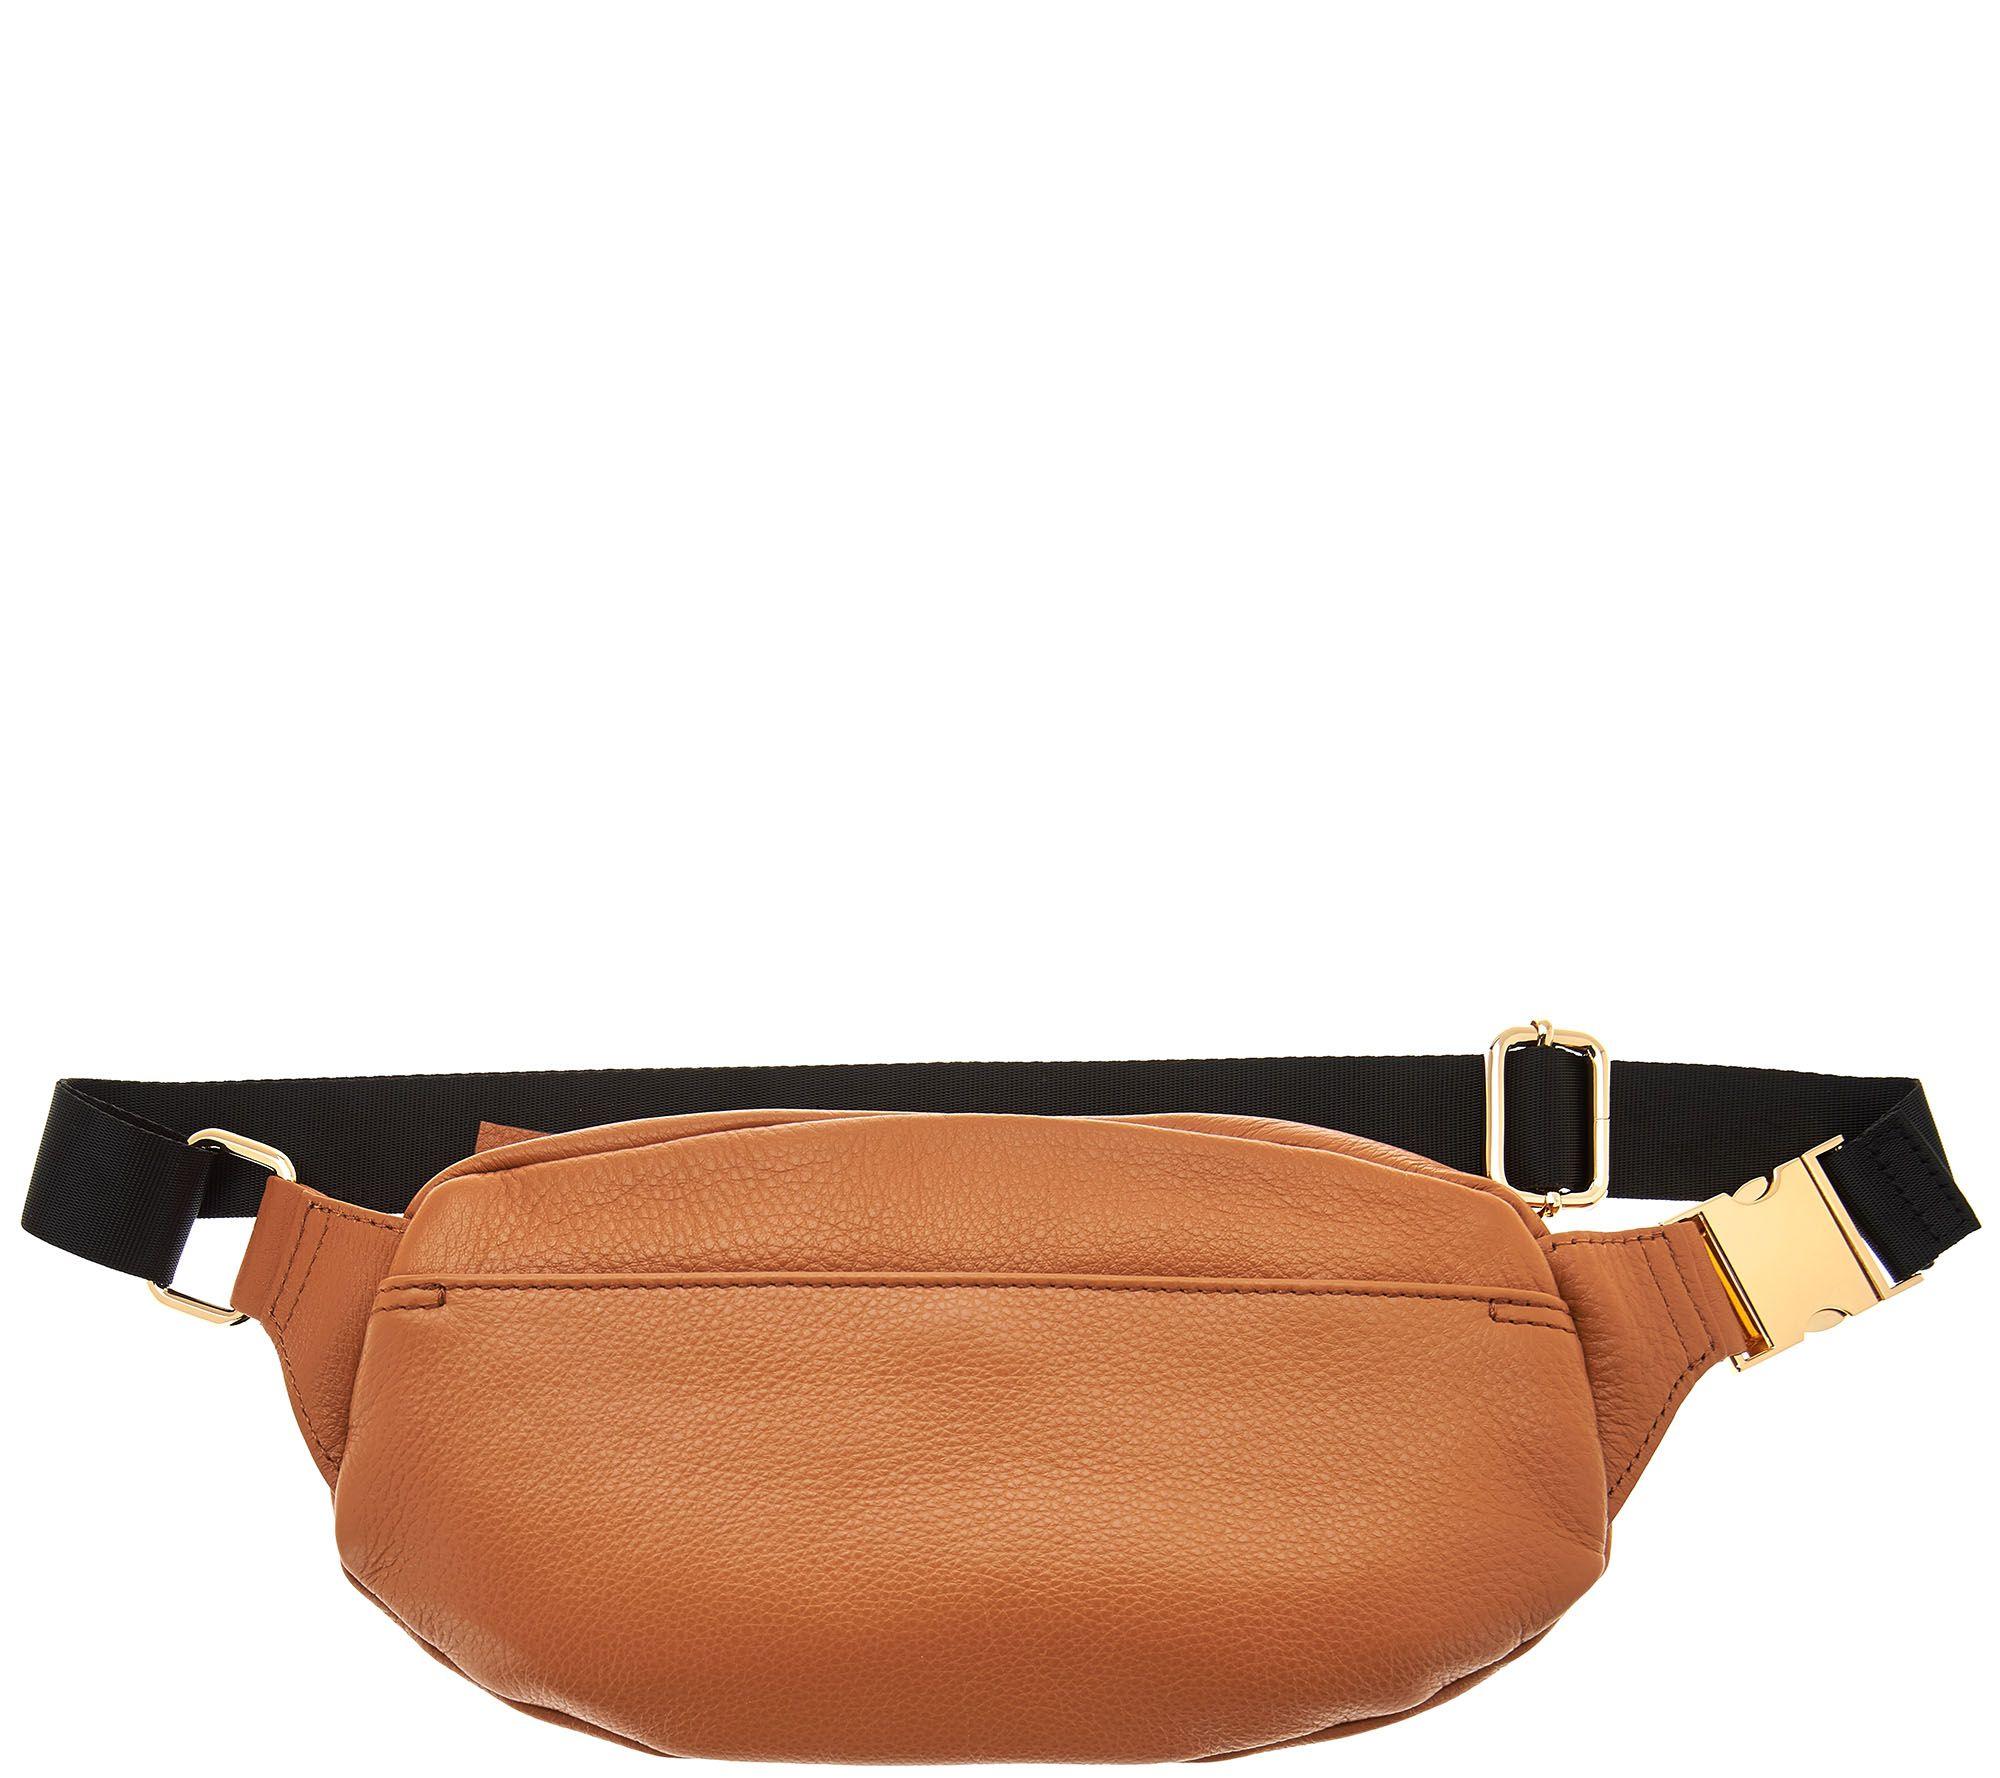 0ba5788353fd Aimee Kestenberg Leather Belt Bag — QVC.com